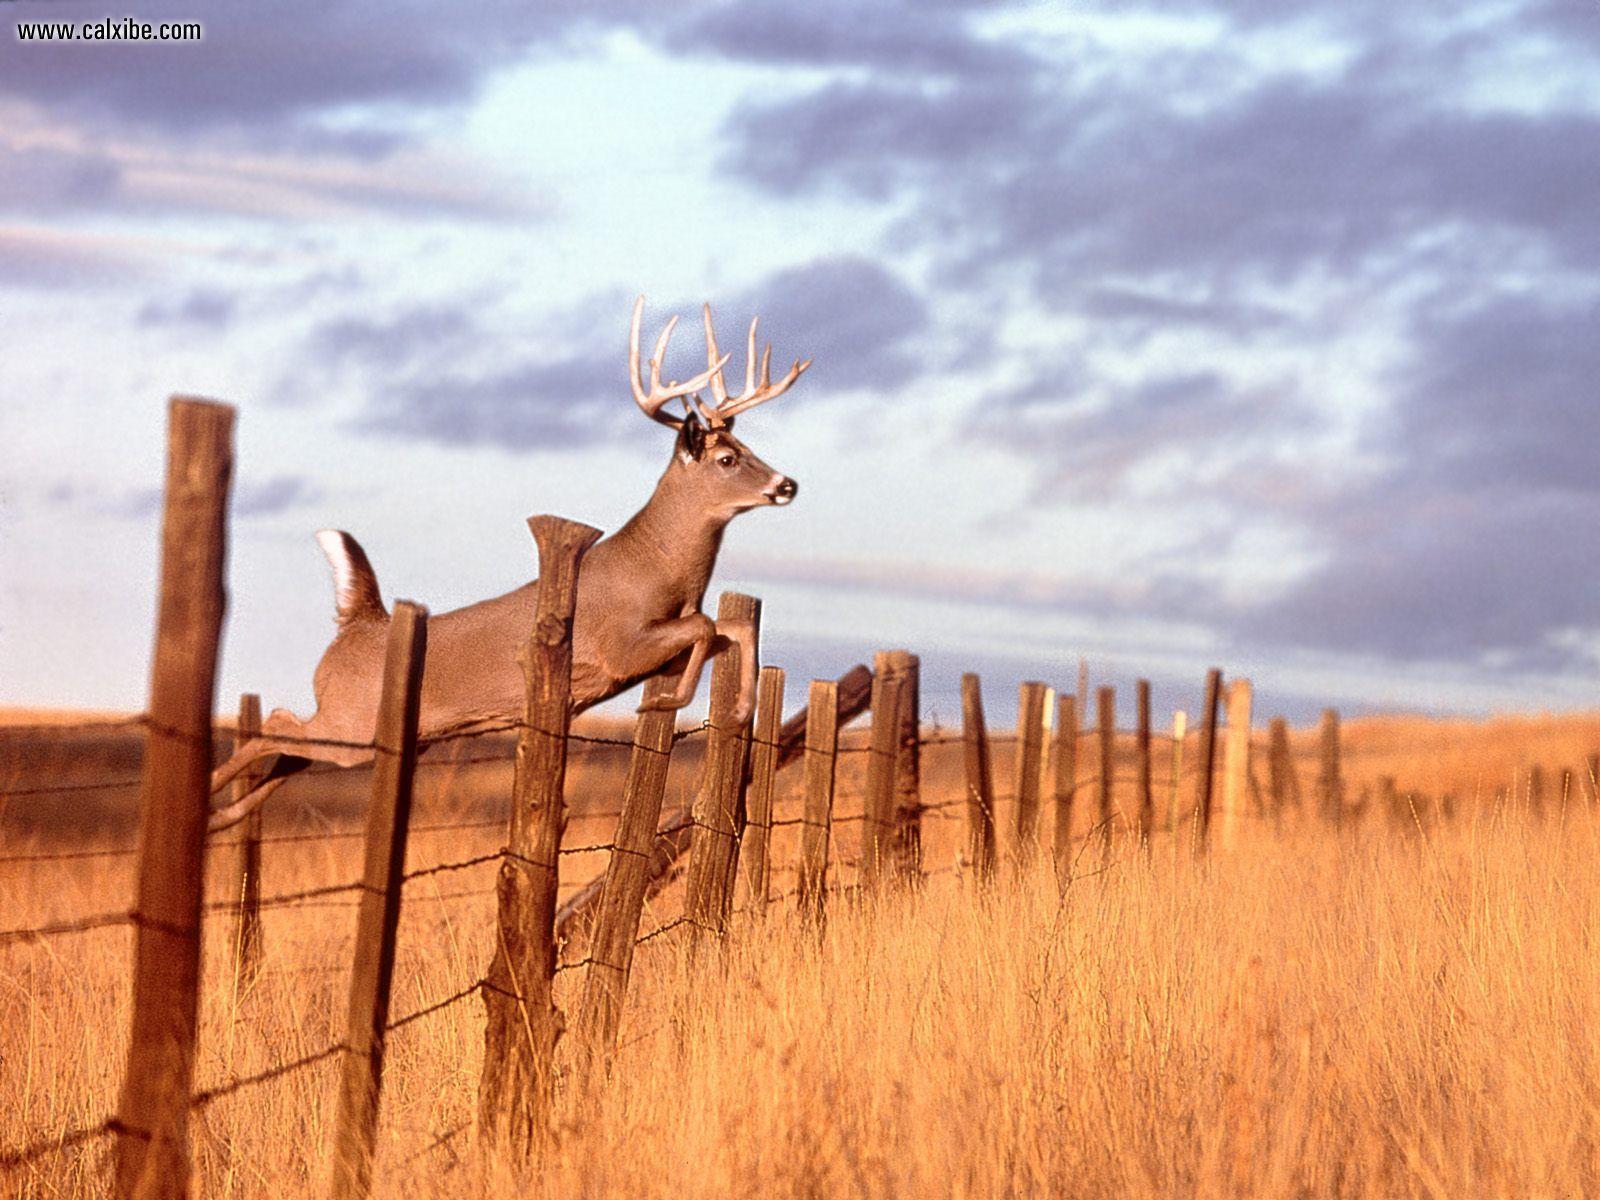 Full HD p Deer Wallpapers HD Desktop Backgrounds x